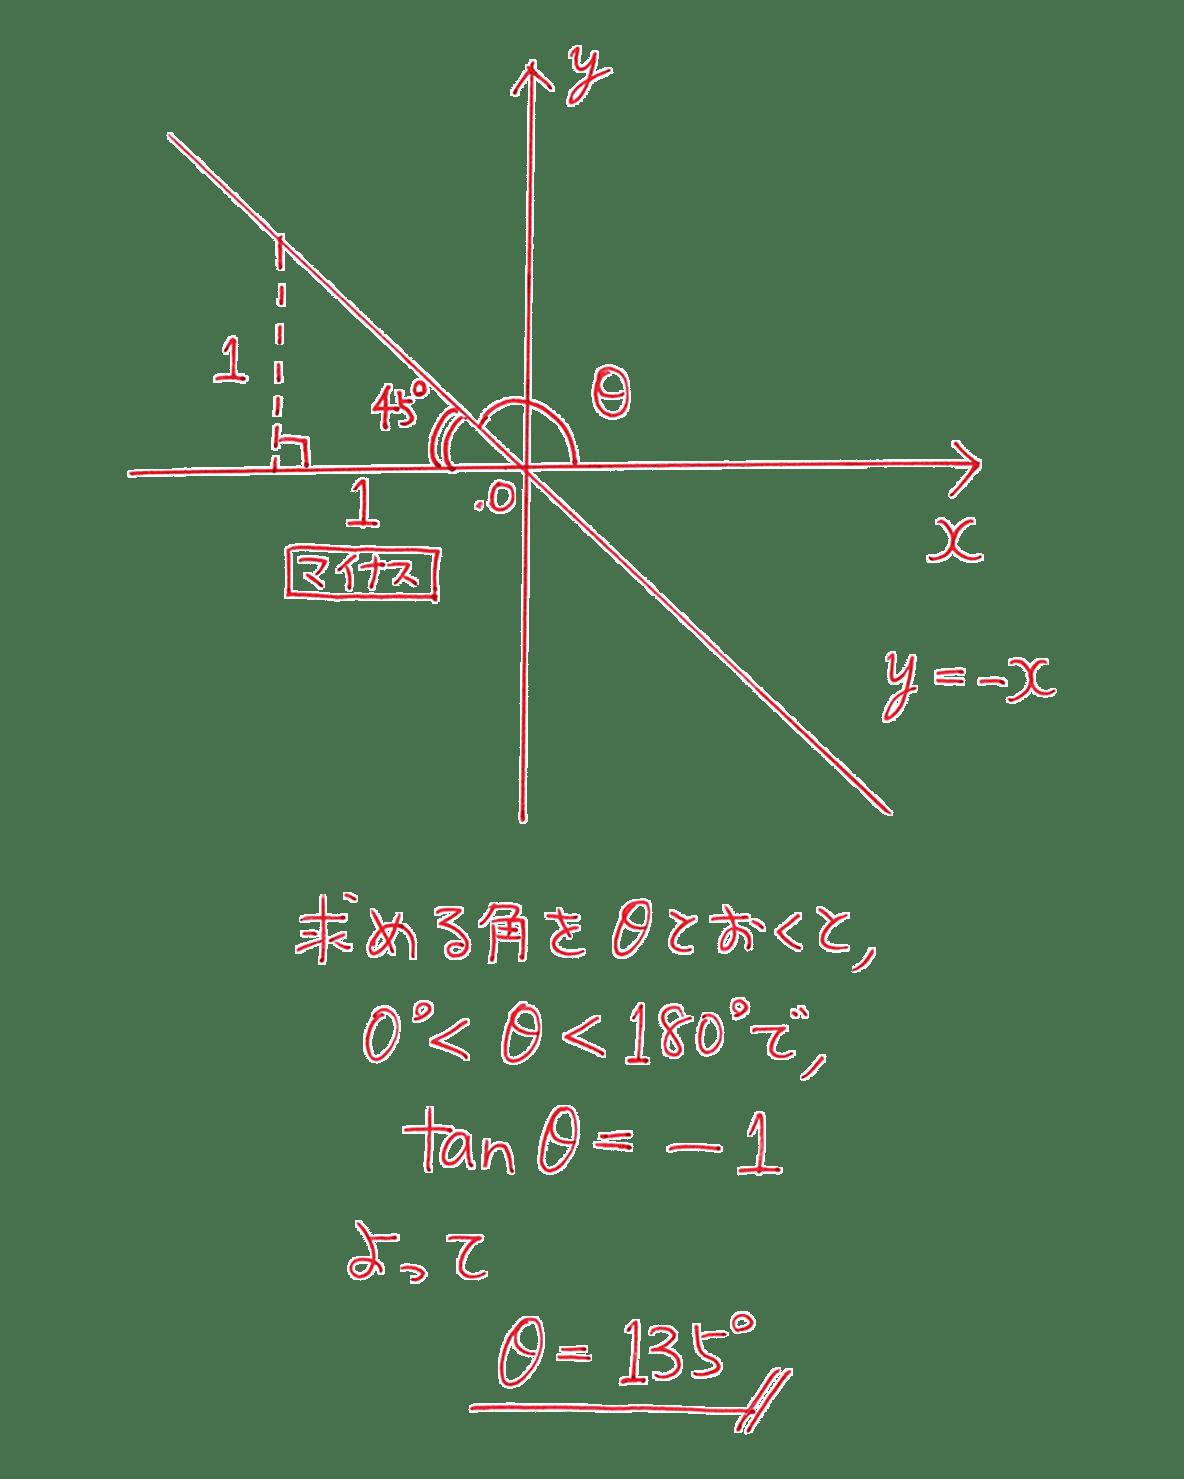 高校数学Ⅰ 三角比19 練習の答え